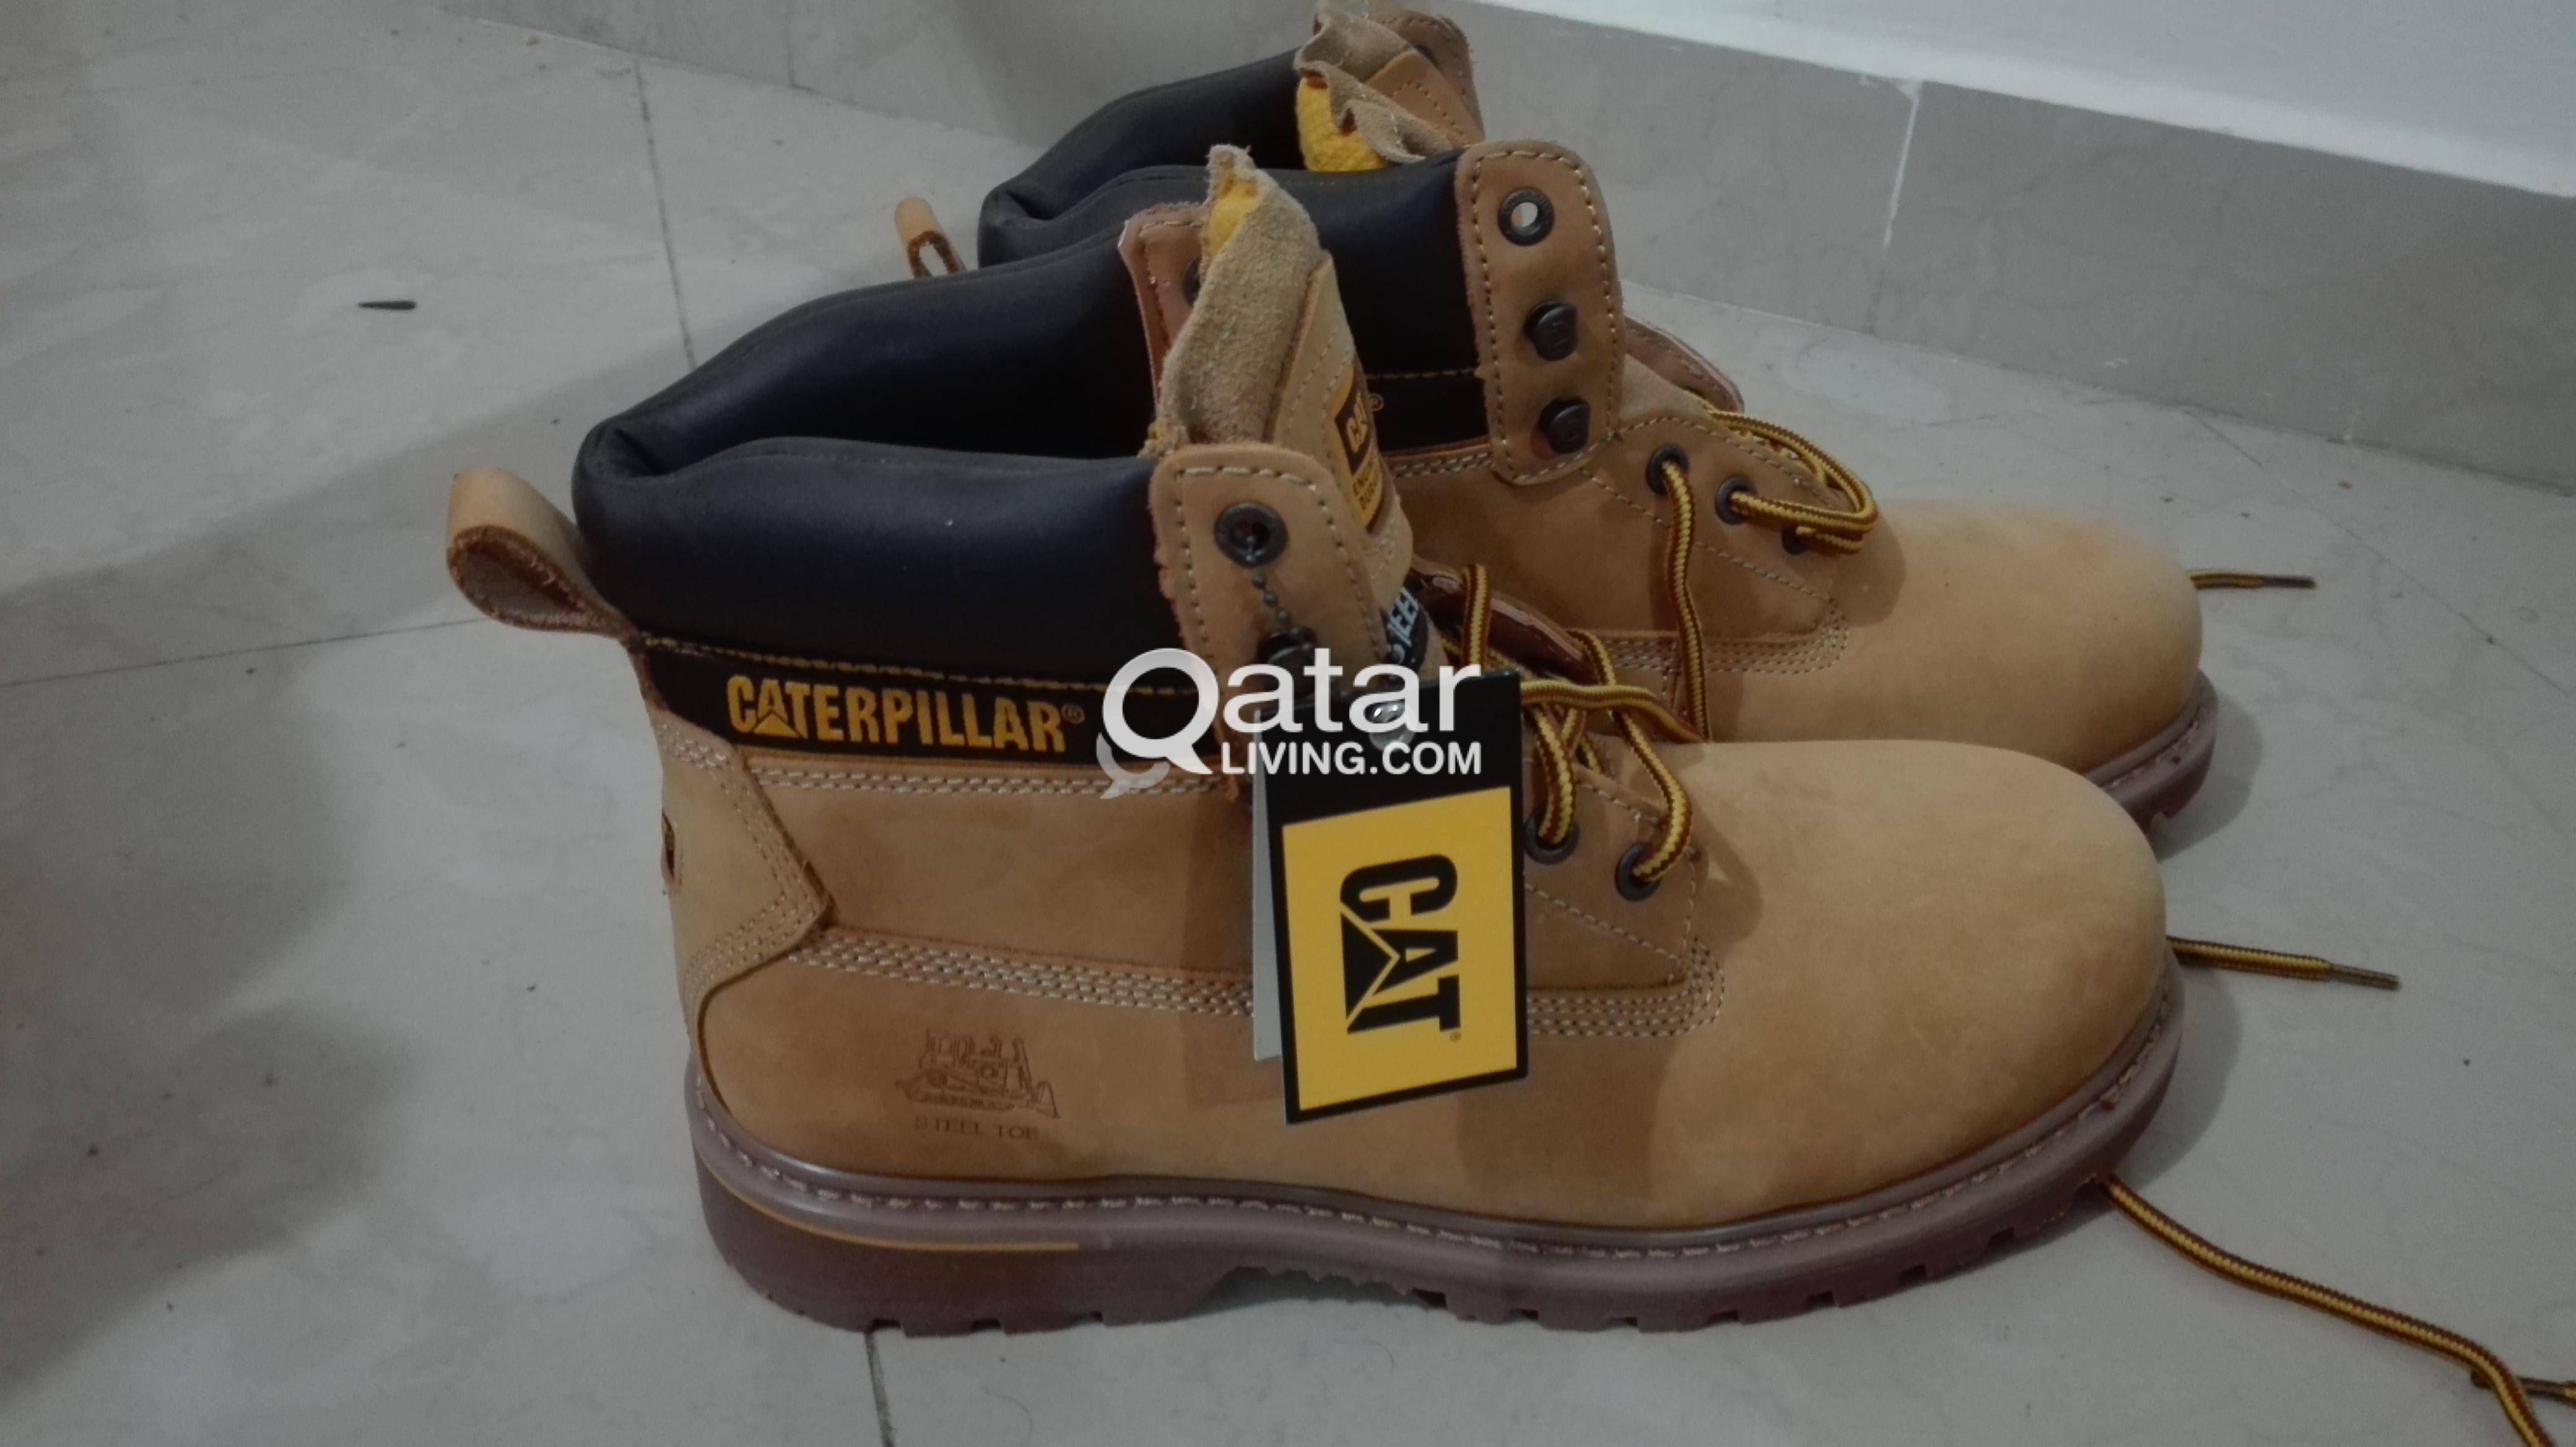 caterpillar shoes steel toe qatar living doha job